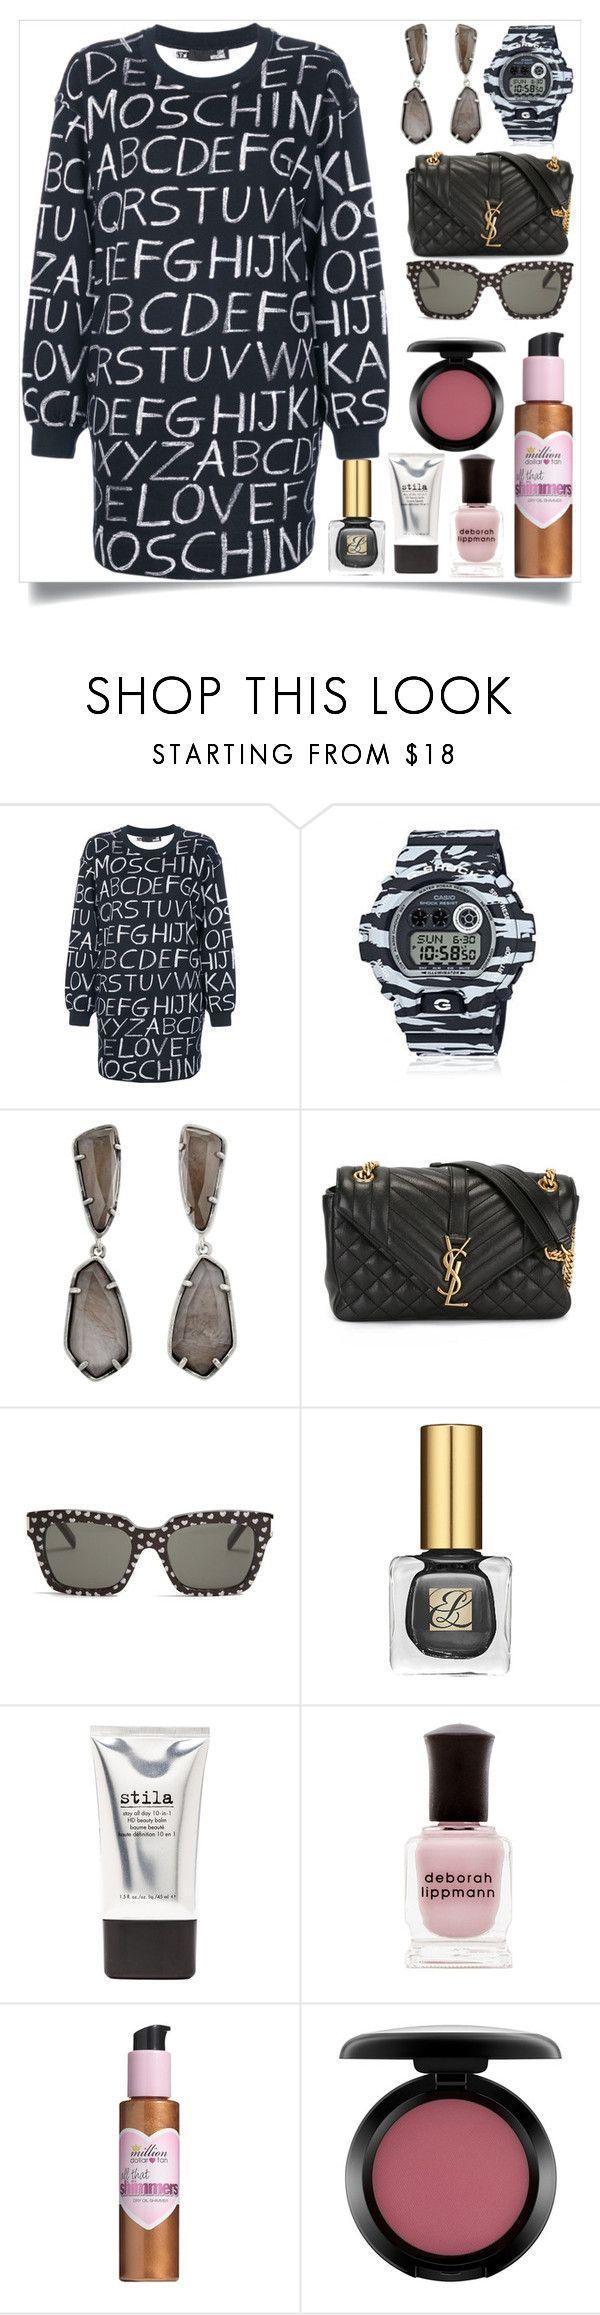 """Alphabet Print Sweater Dress"" by camry-brynn ❤ liked on Polyvore featuring Love Moschino, G-Shock, Kendra Scott, Yves Saint Laurent, Stila, Deborah Lippmann, Million Dollar Tan and MAC Cosmetics"